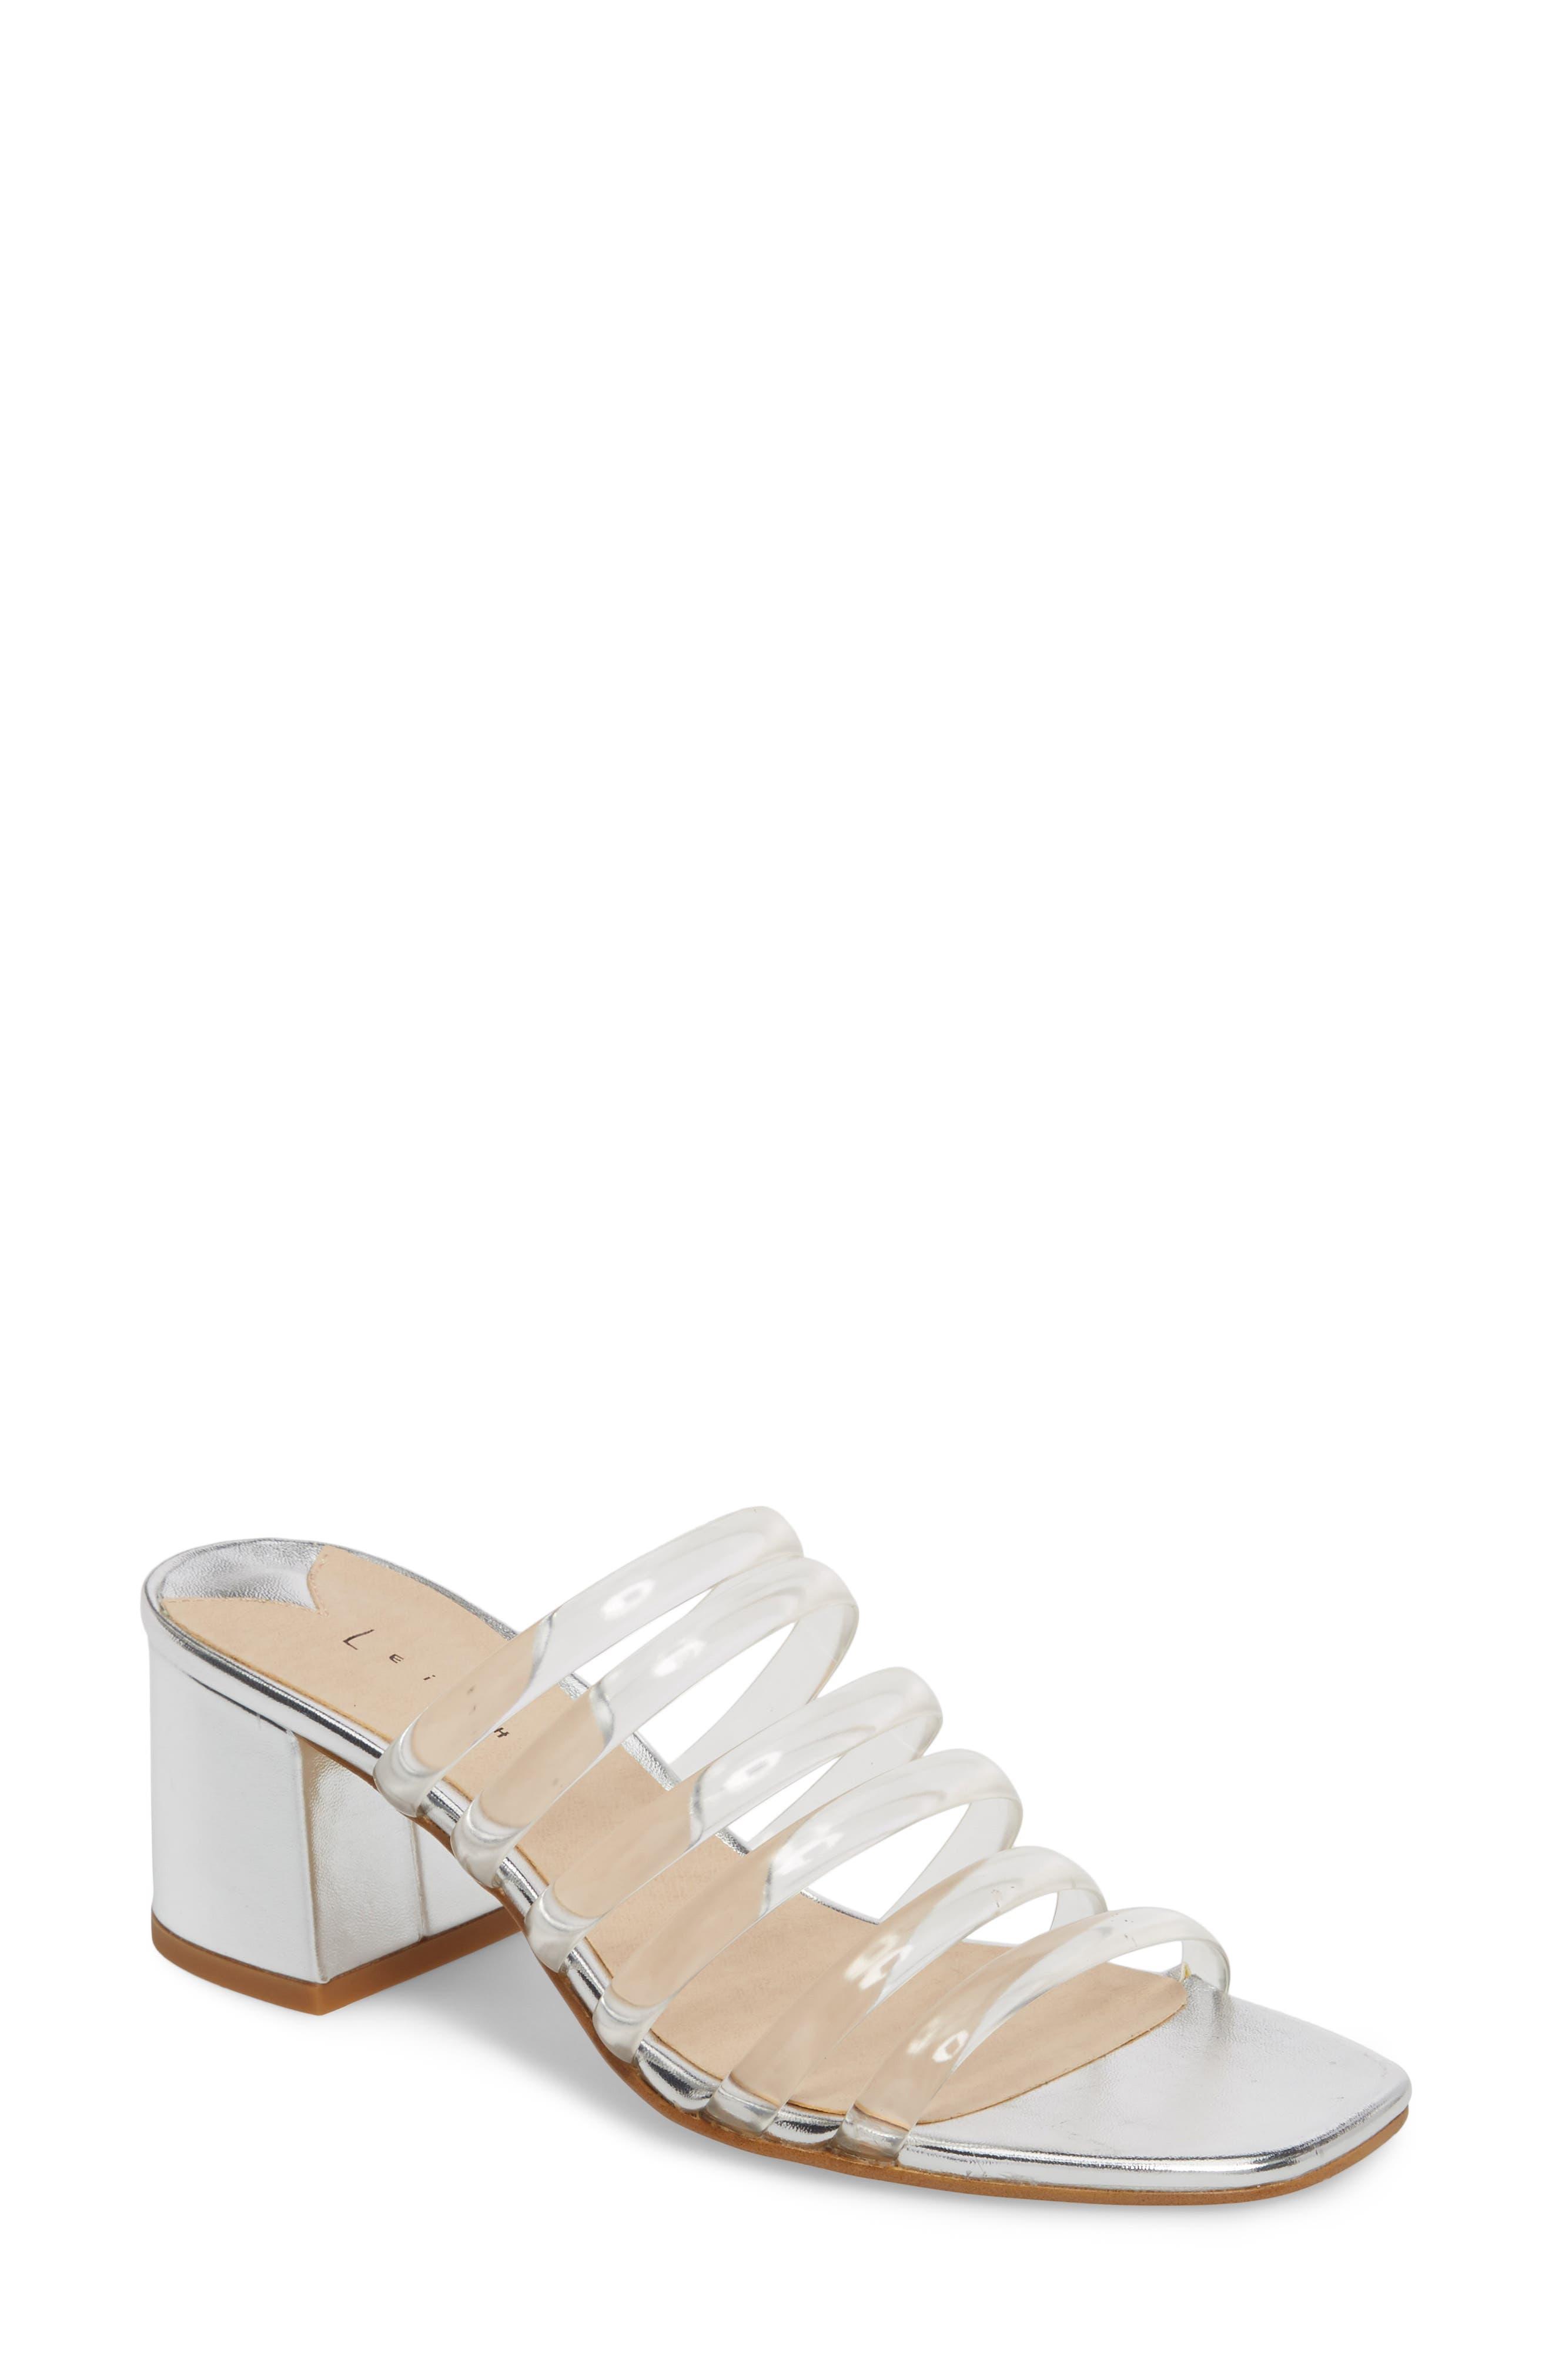 Cloud Jelly Slide Sandal,                         Main,                         color, Clear